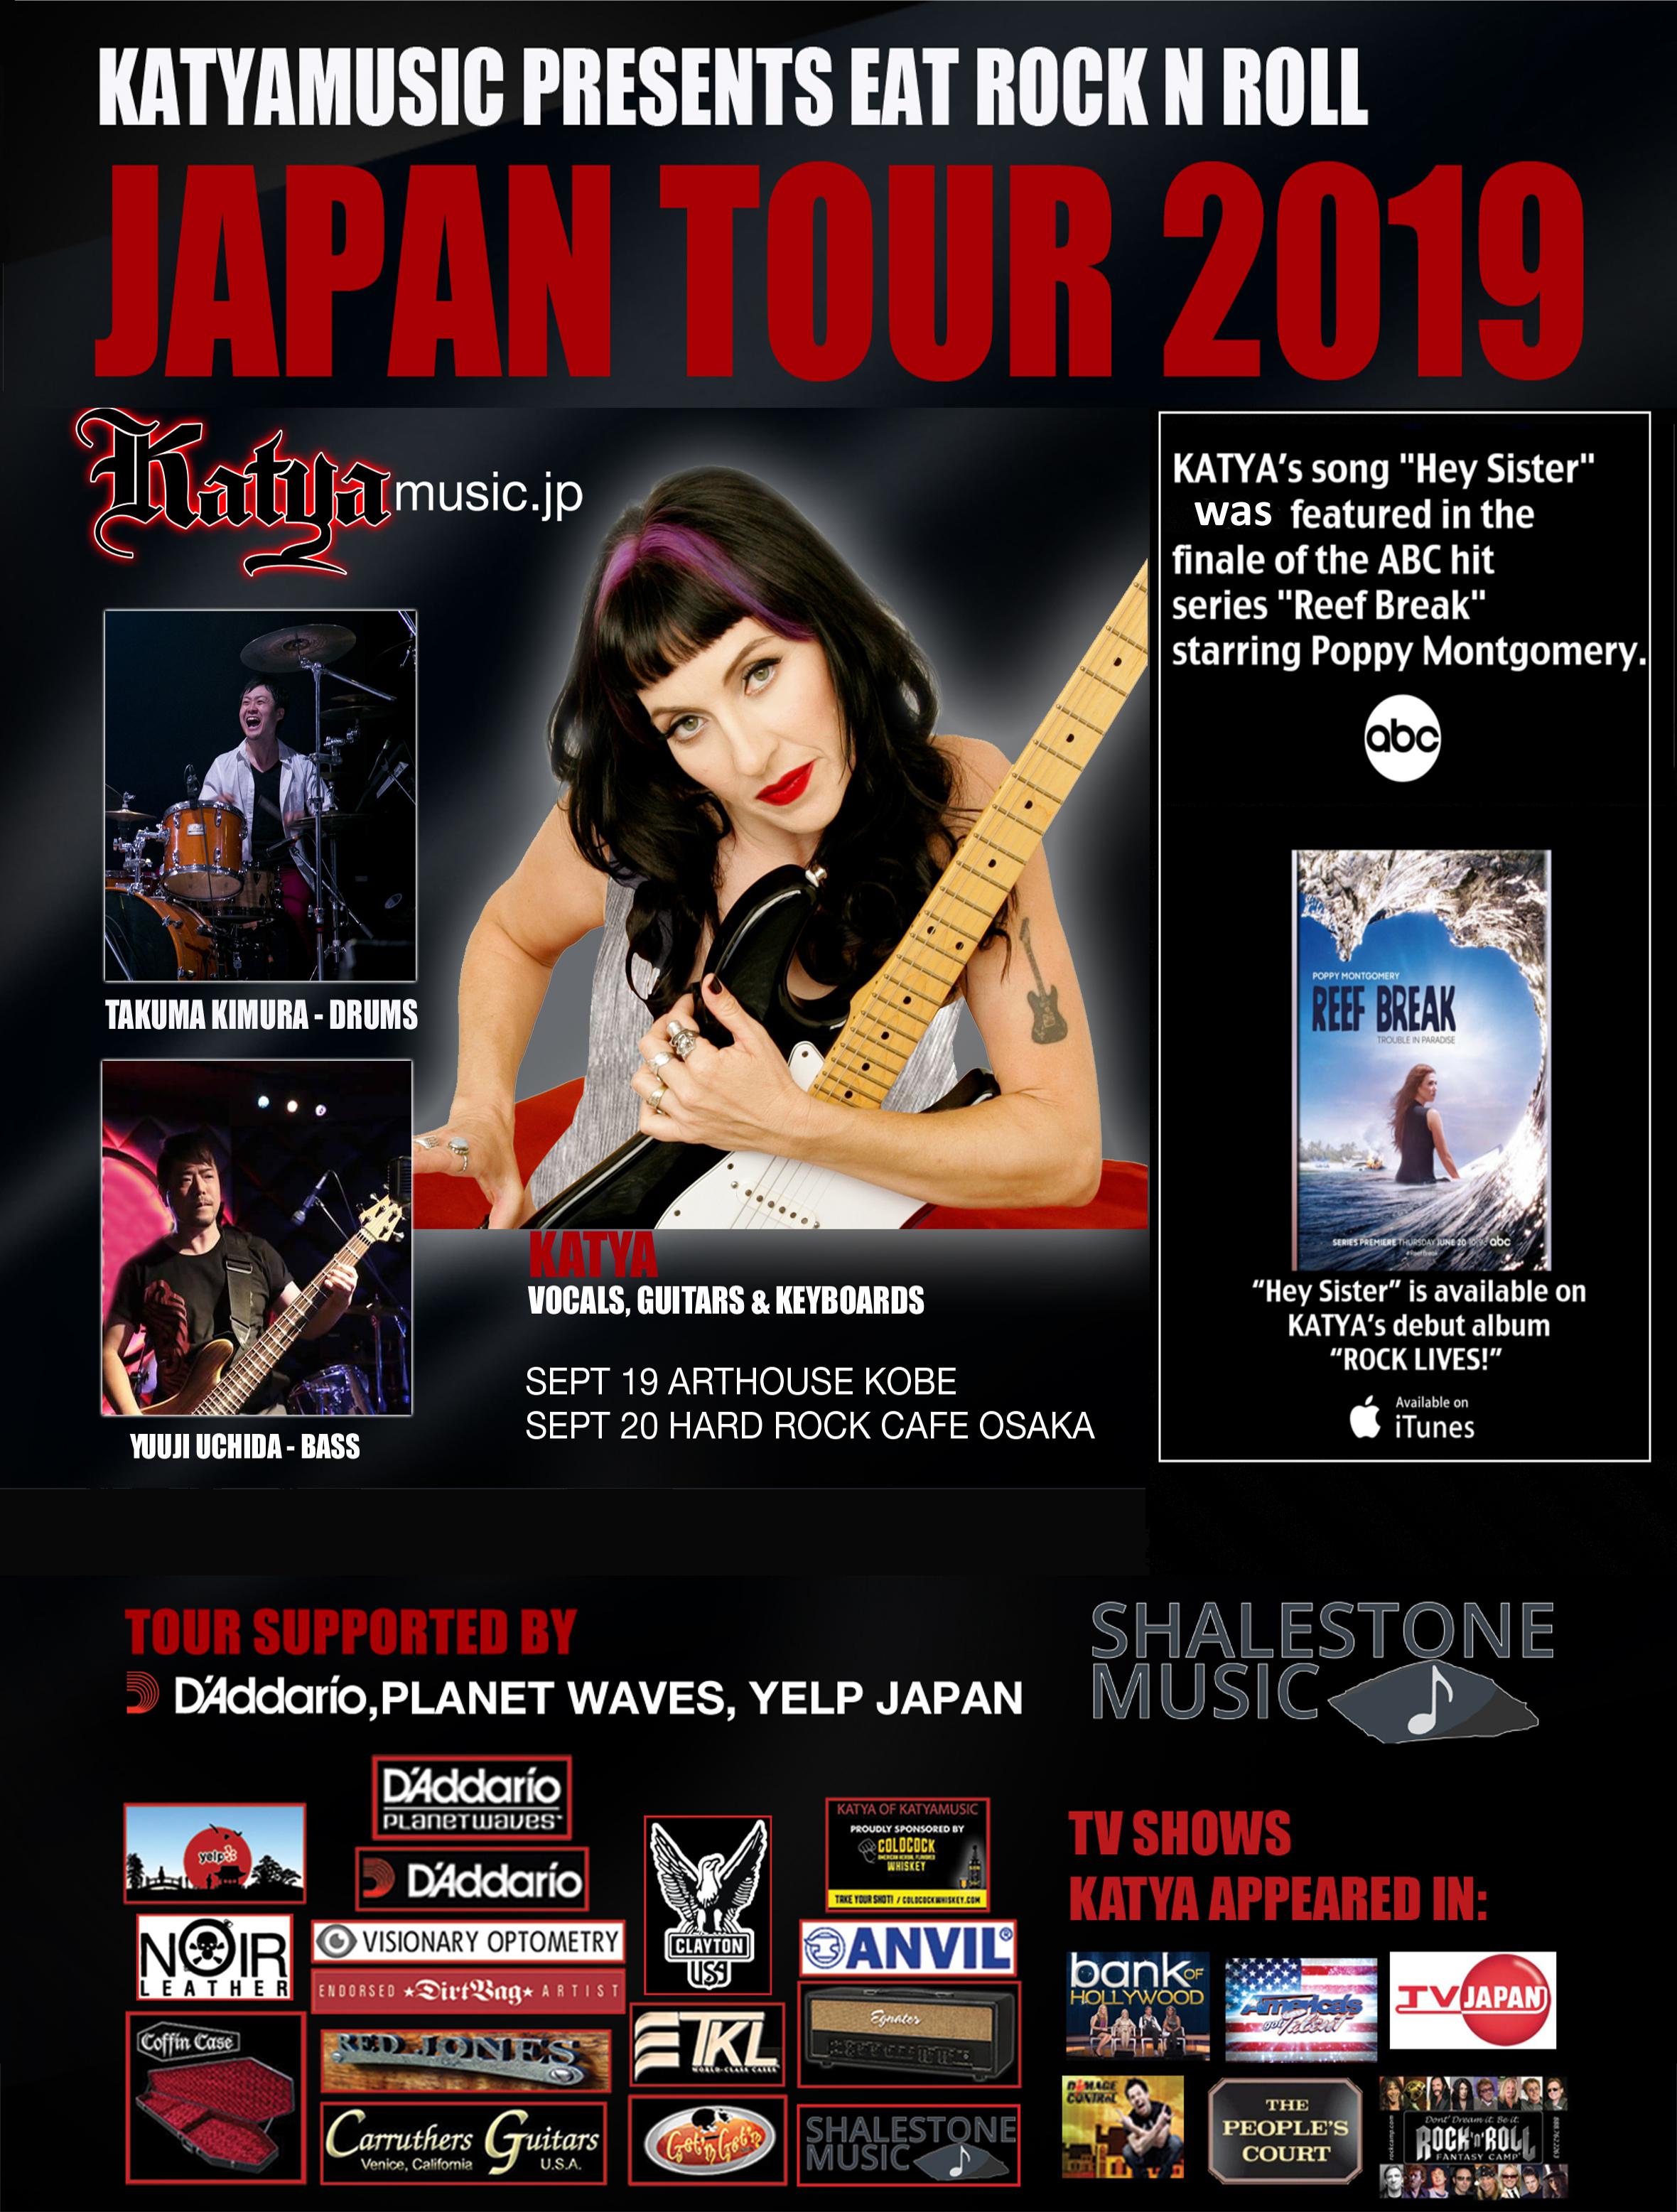 KATYA 2019 JAPAN TOUR